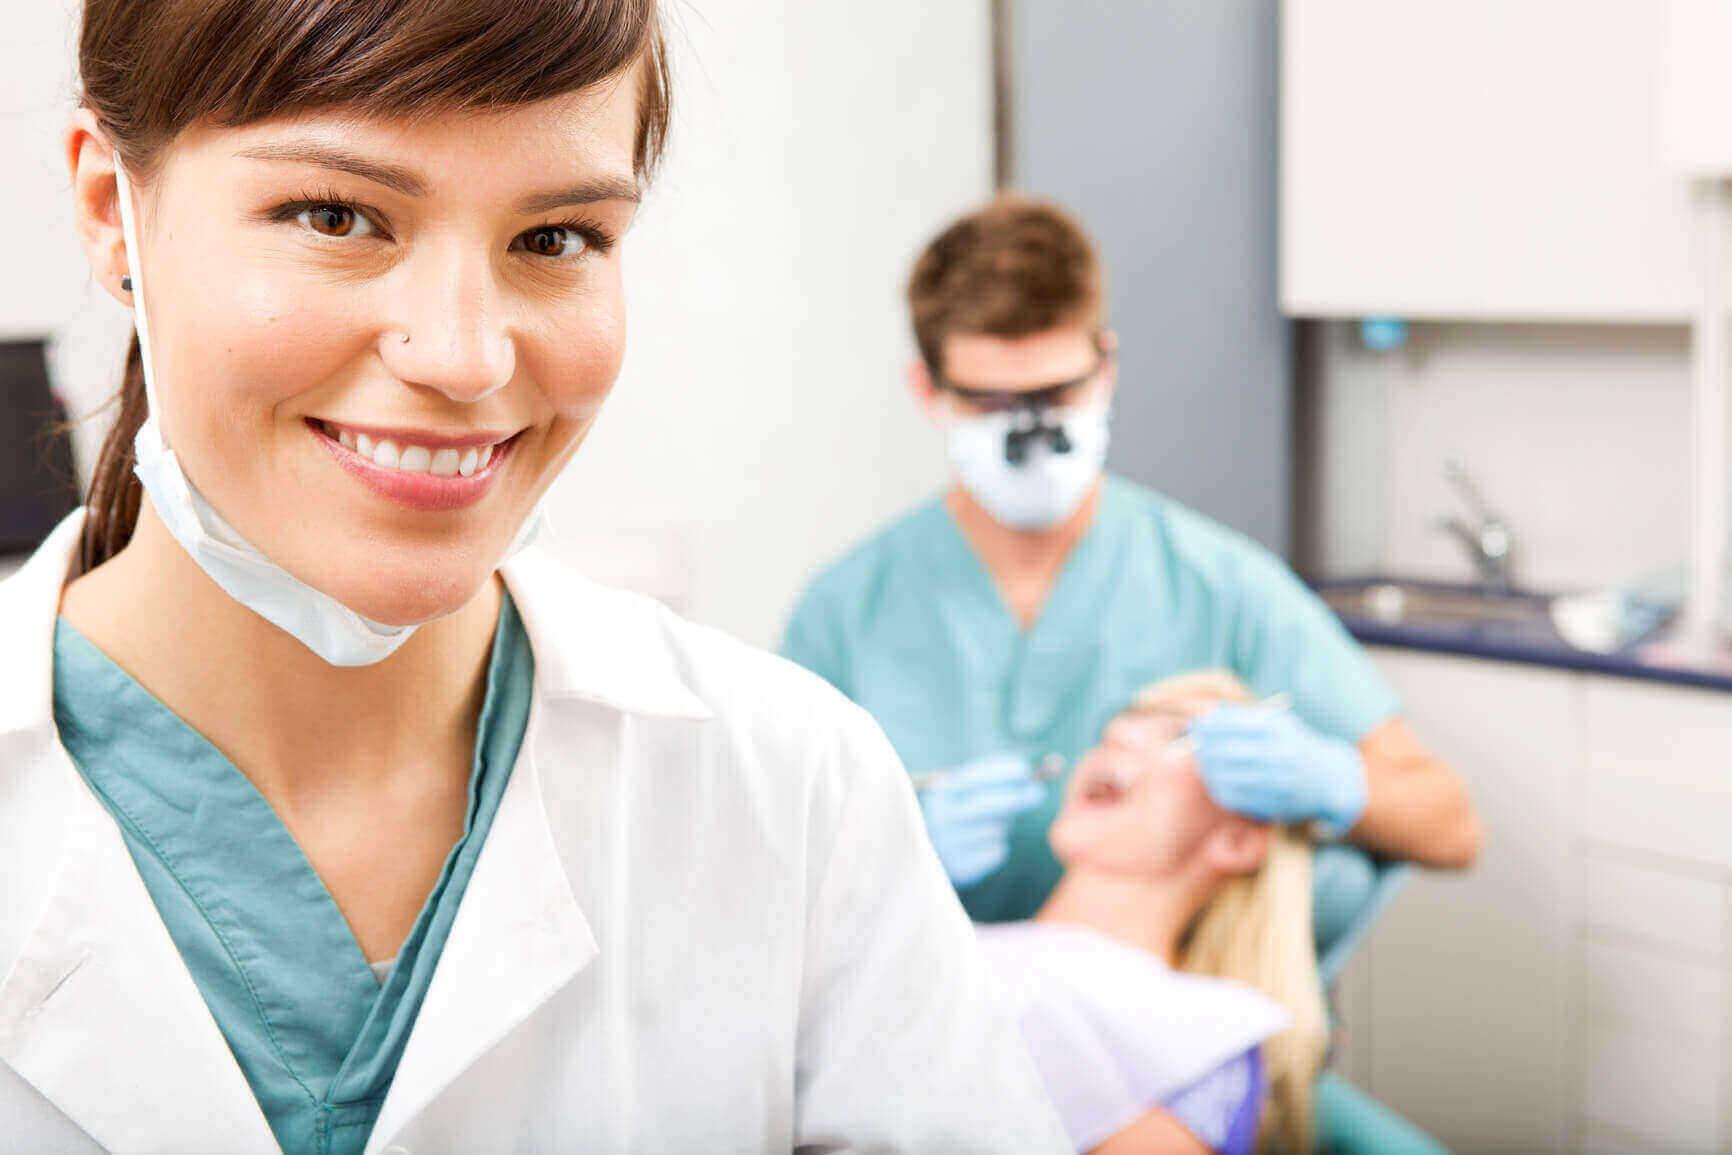 Pediatric Dentist vs. General Dentist: The Right Choice(s) for Your Children